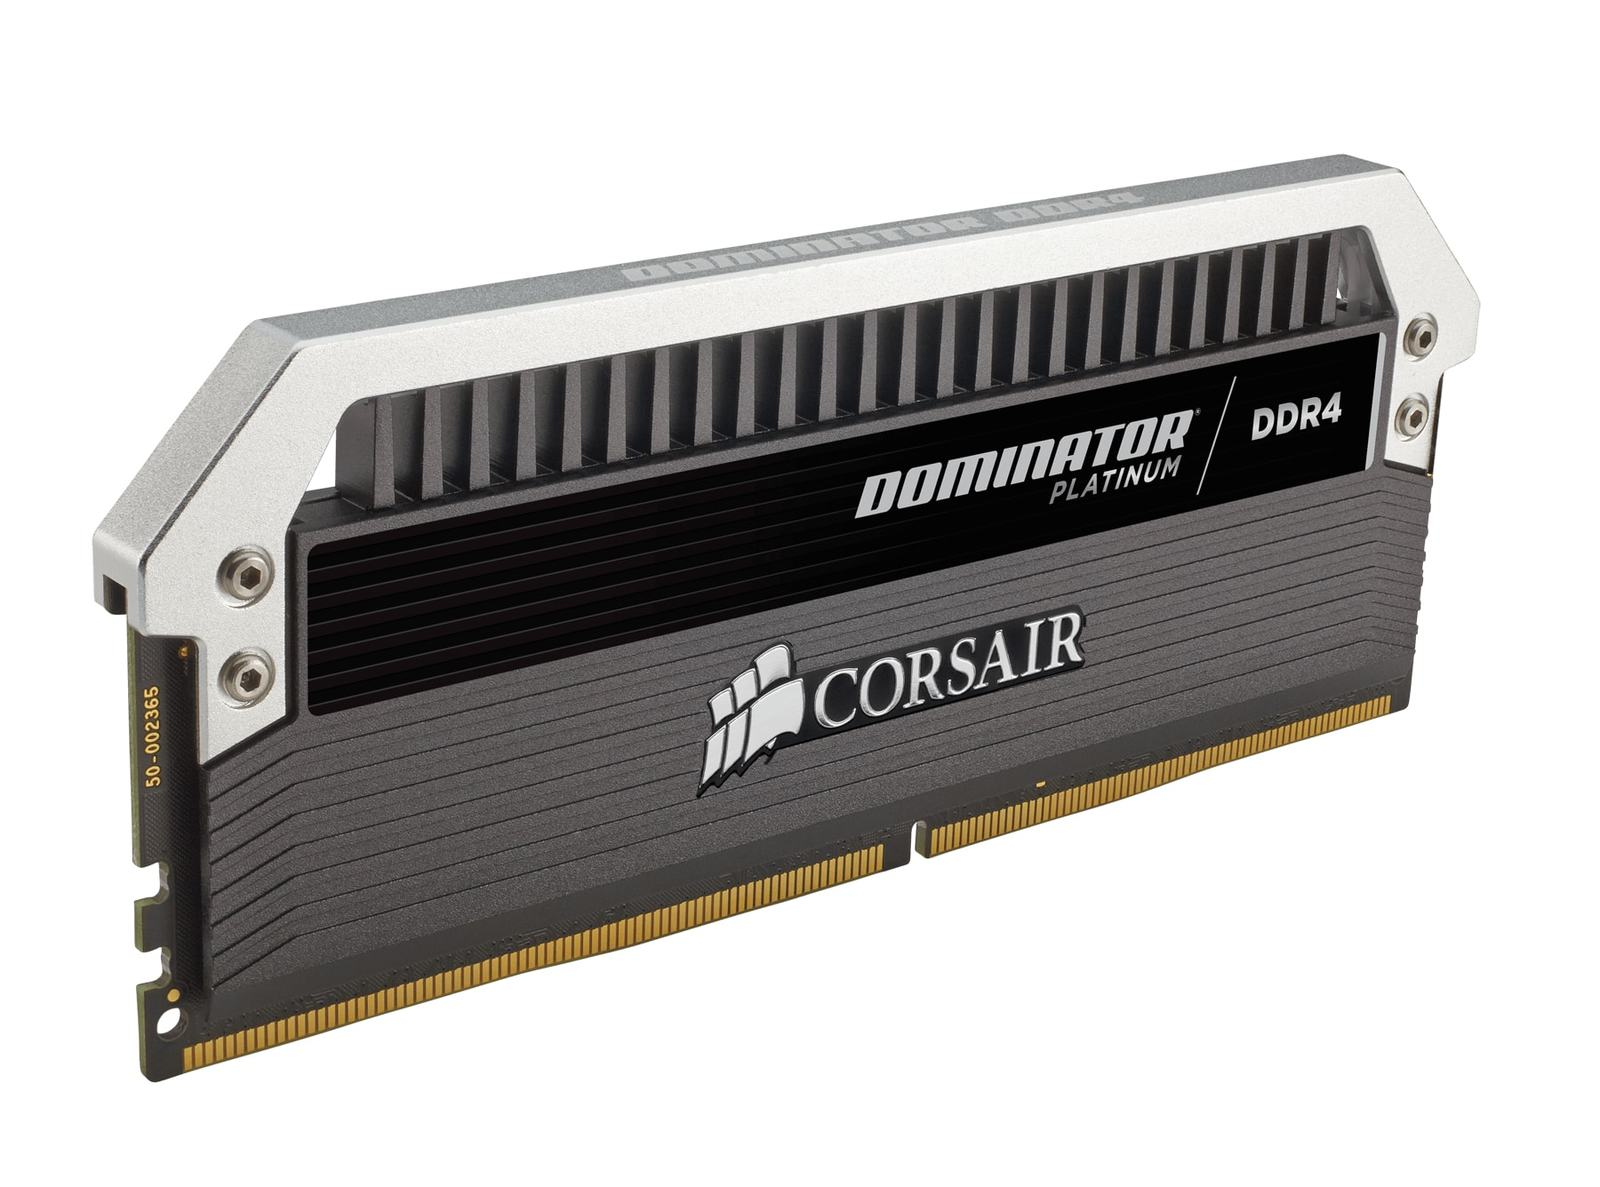 16GB Corsair Dominator Platinum Series (2 x 8GB) DDR4 DRAM 3200MHz C16 Memory Kit image